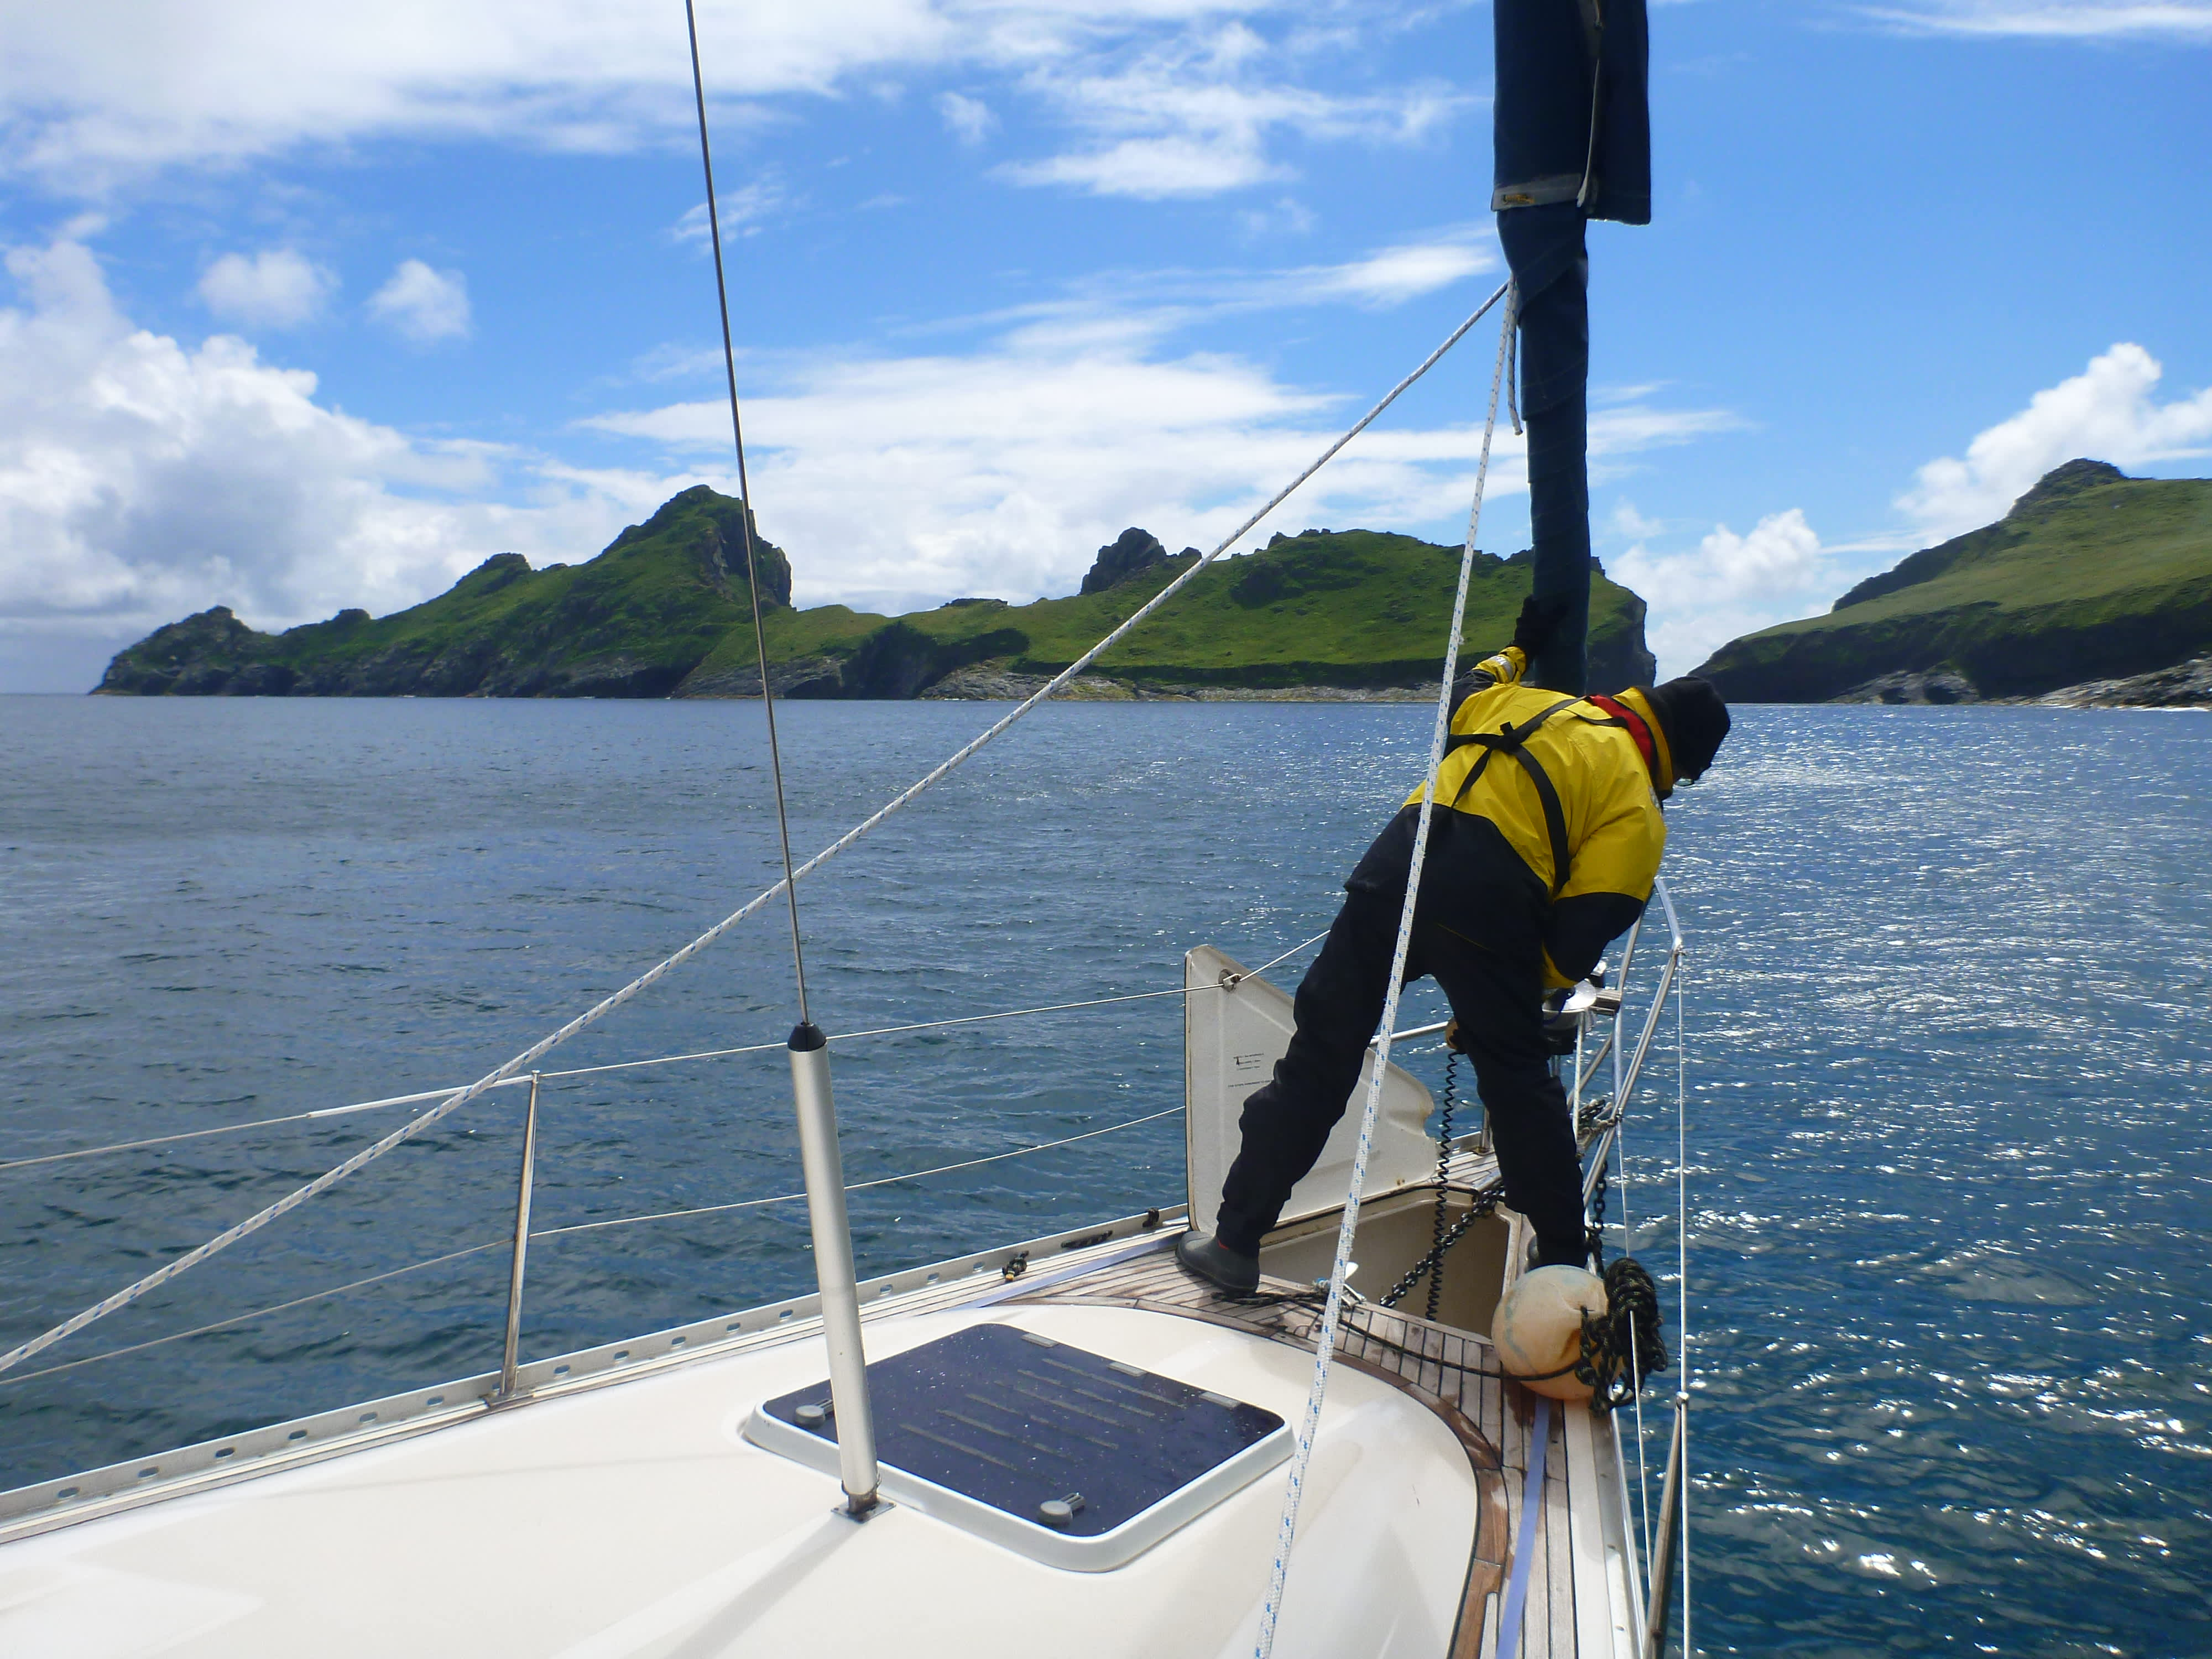 RYA Day skipper training, anchorage practicing